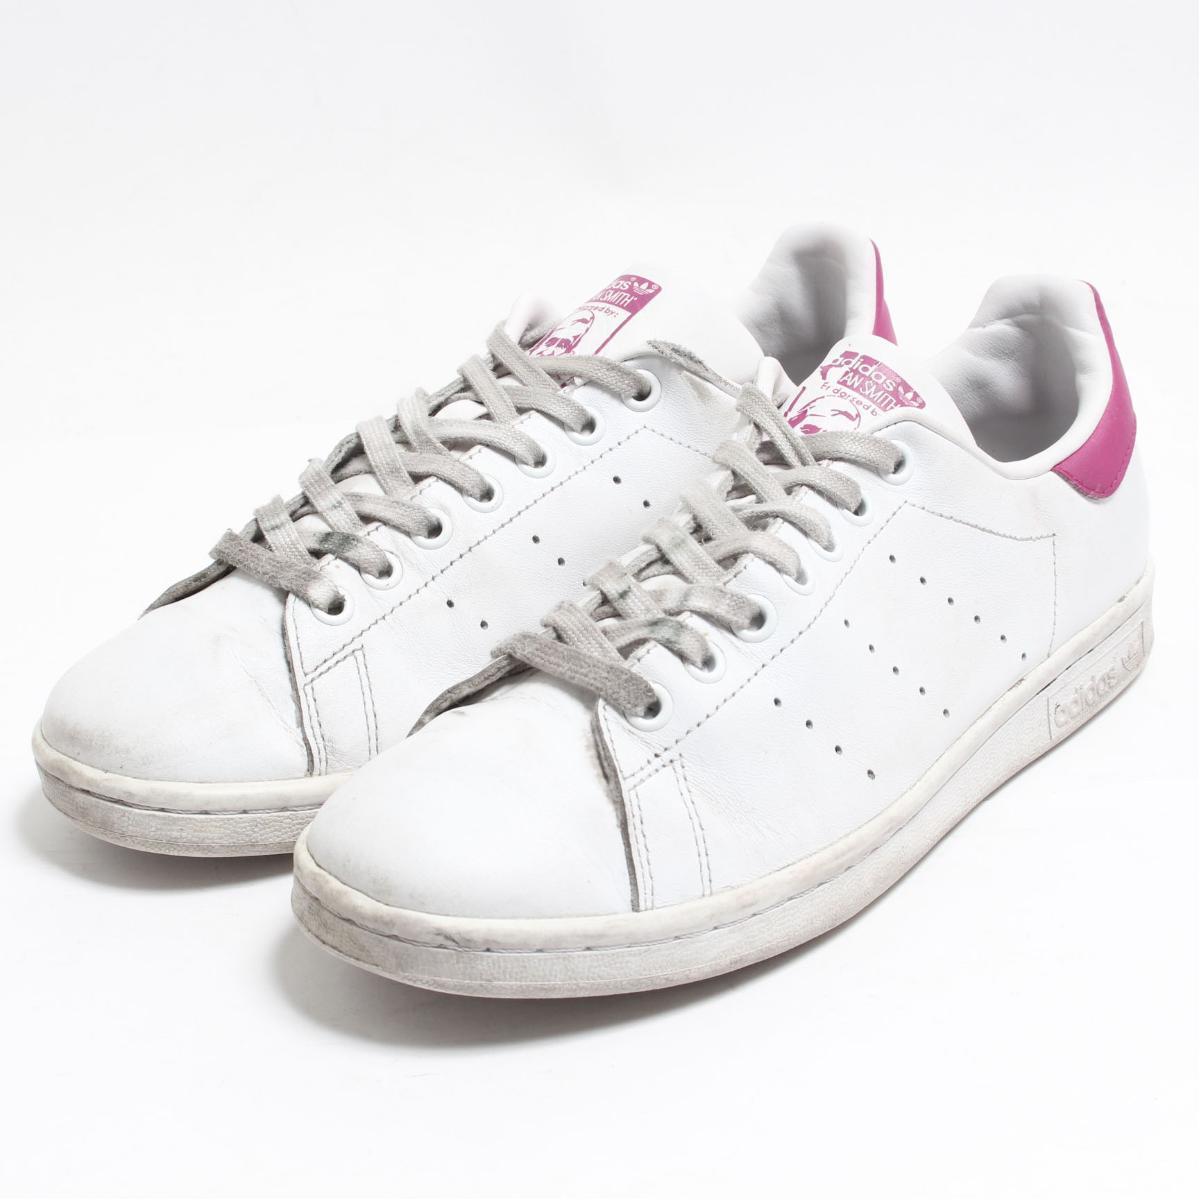 online store 2ea7c 7d027 Adidas adidas STAN SMITH Stan Smith sneakers US7 men 25.5cm /boo7994